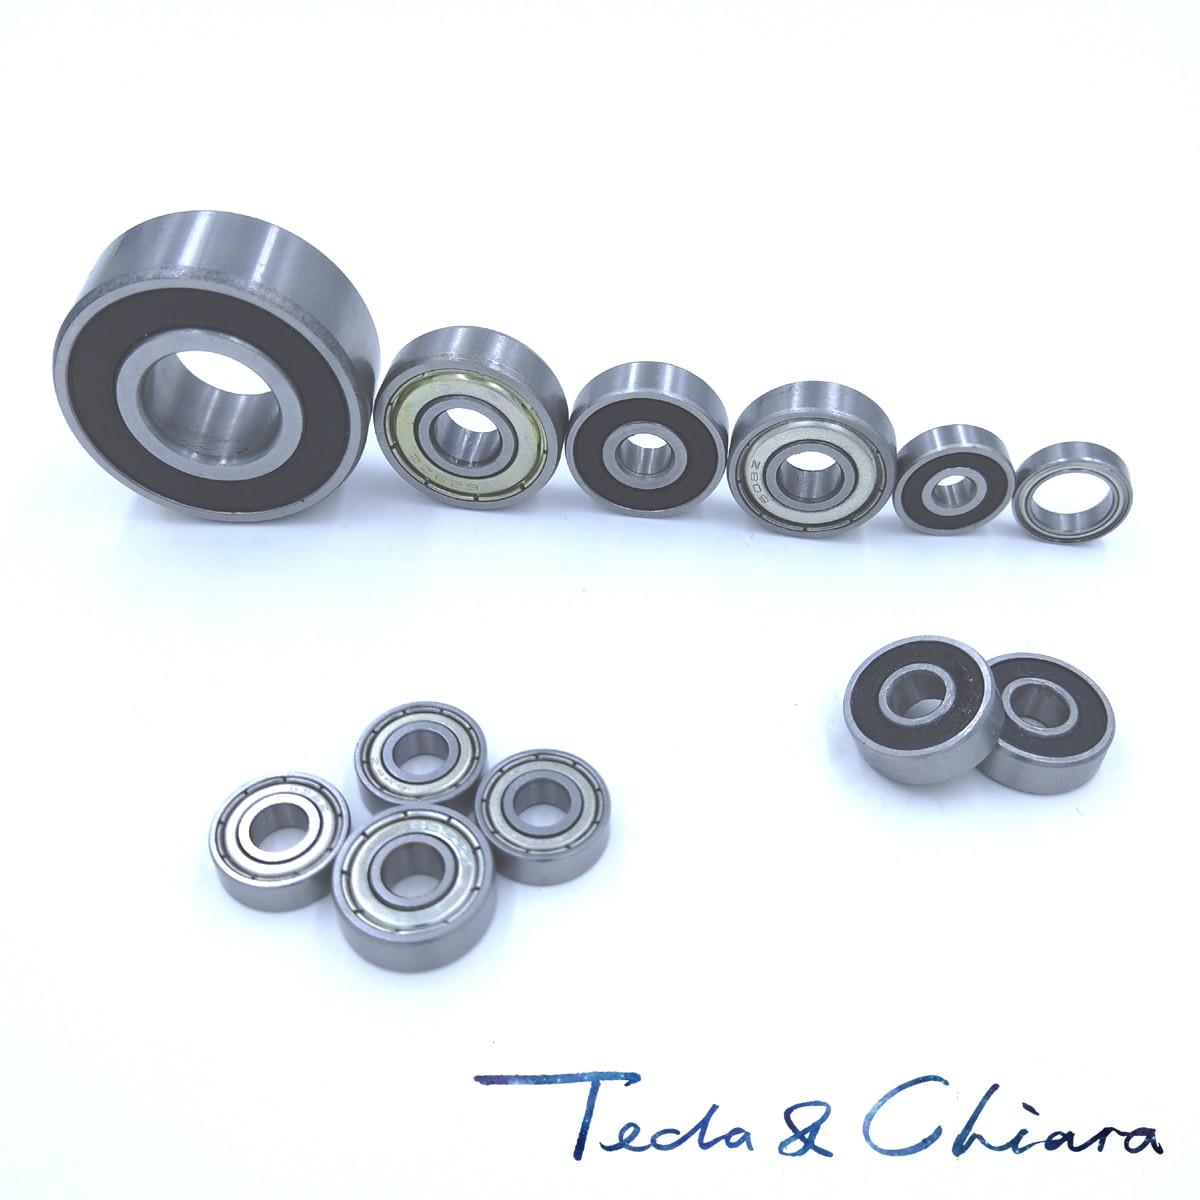 10Pcs 1Lot MR148 MR148ZZ MR148RS MR148-2Z MR148Z MR148-2RS ZZ RS RZ 2RZ L-1480ZZ Deep Groove Ball Bearings 8 X 14 X 4mm